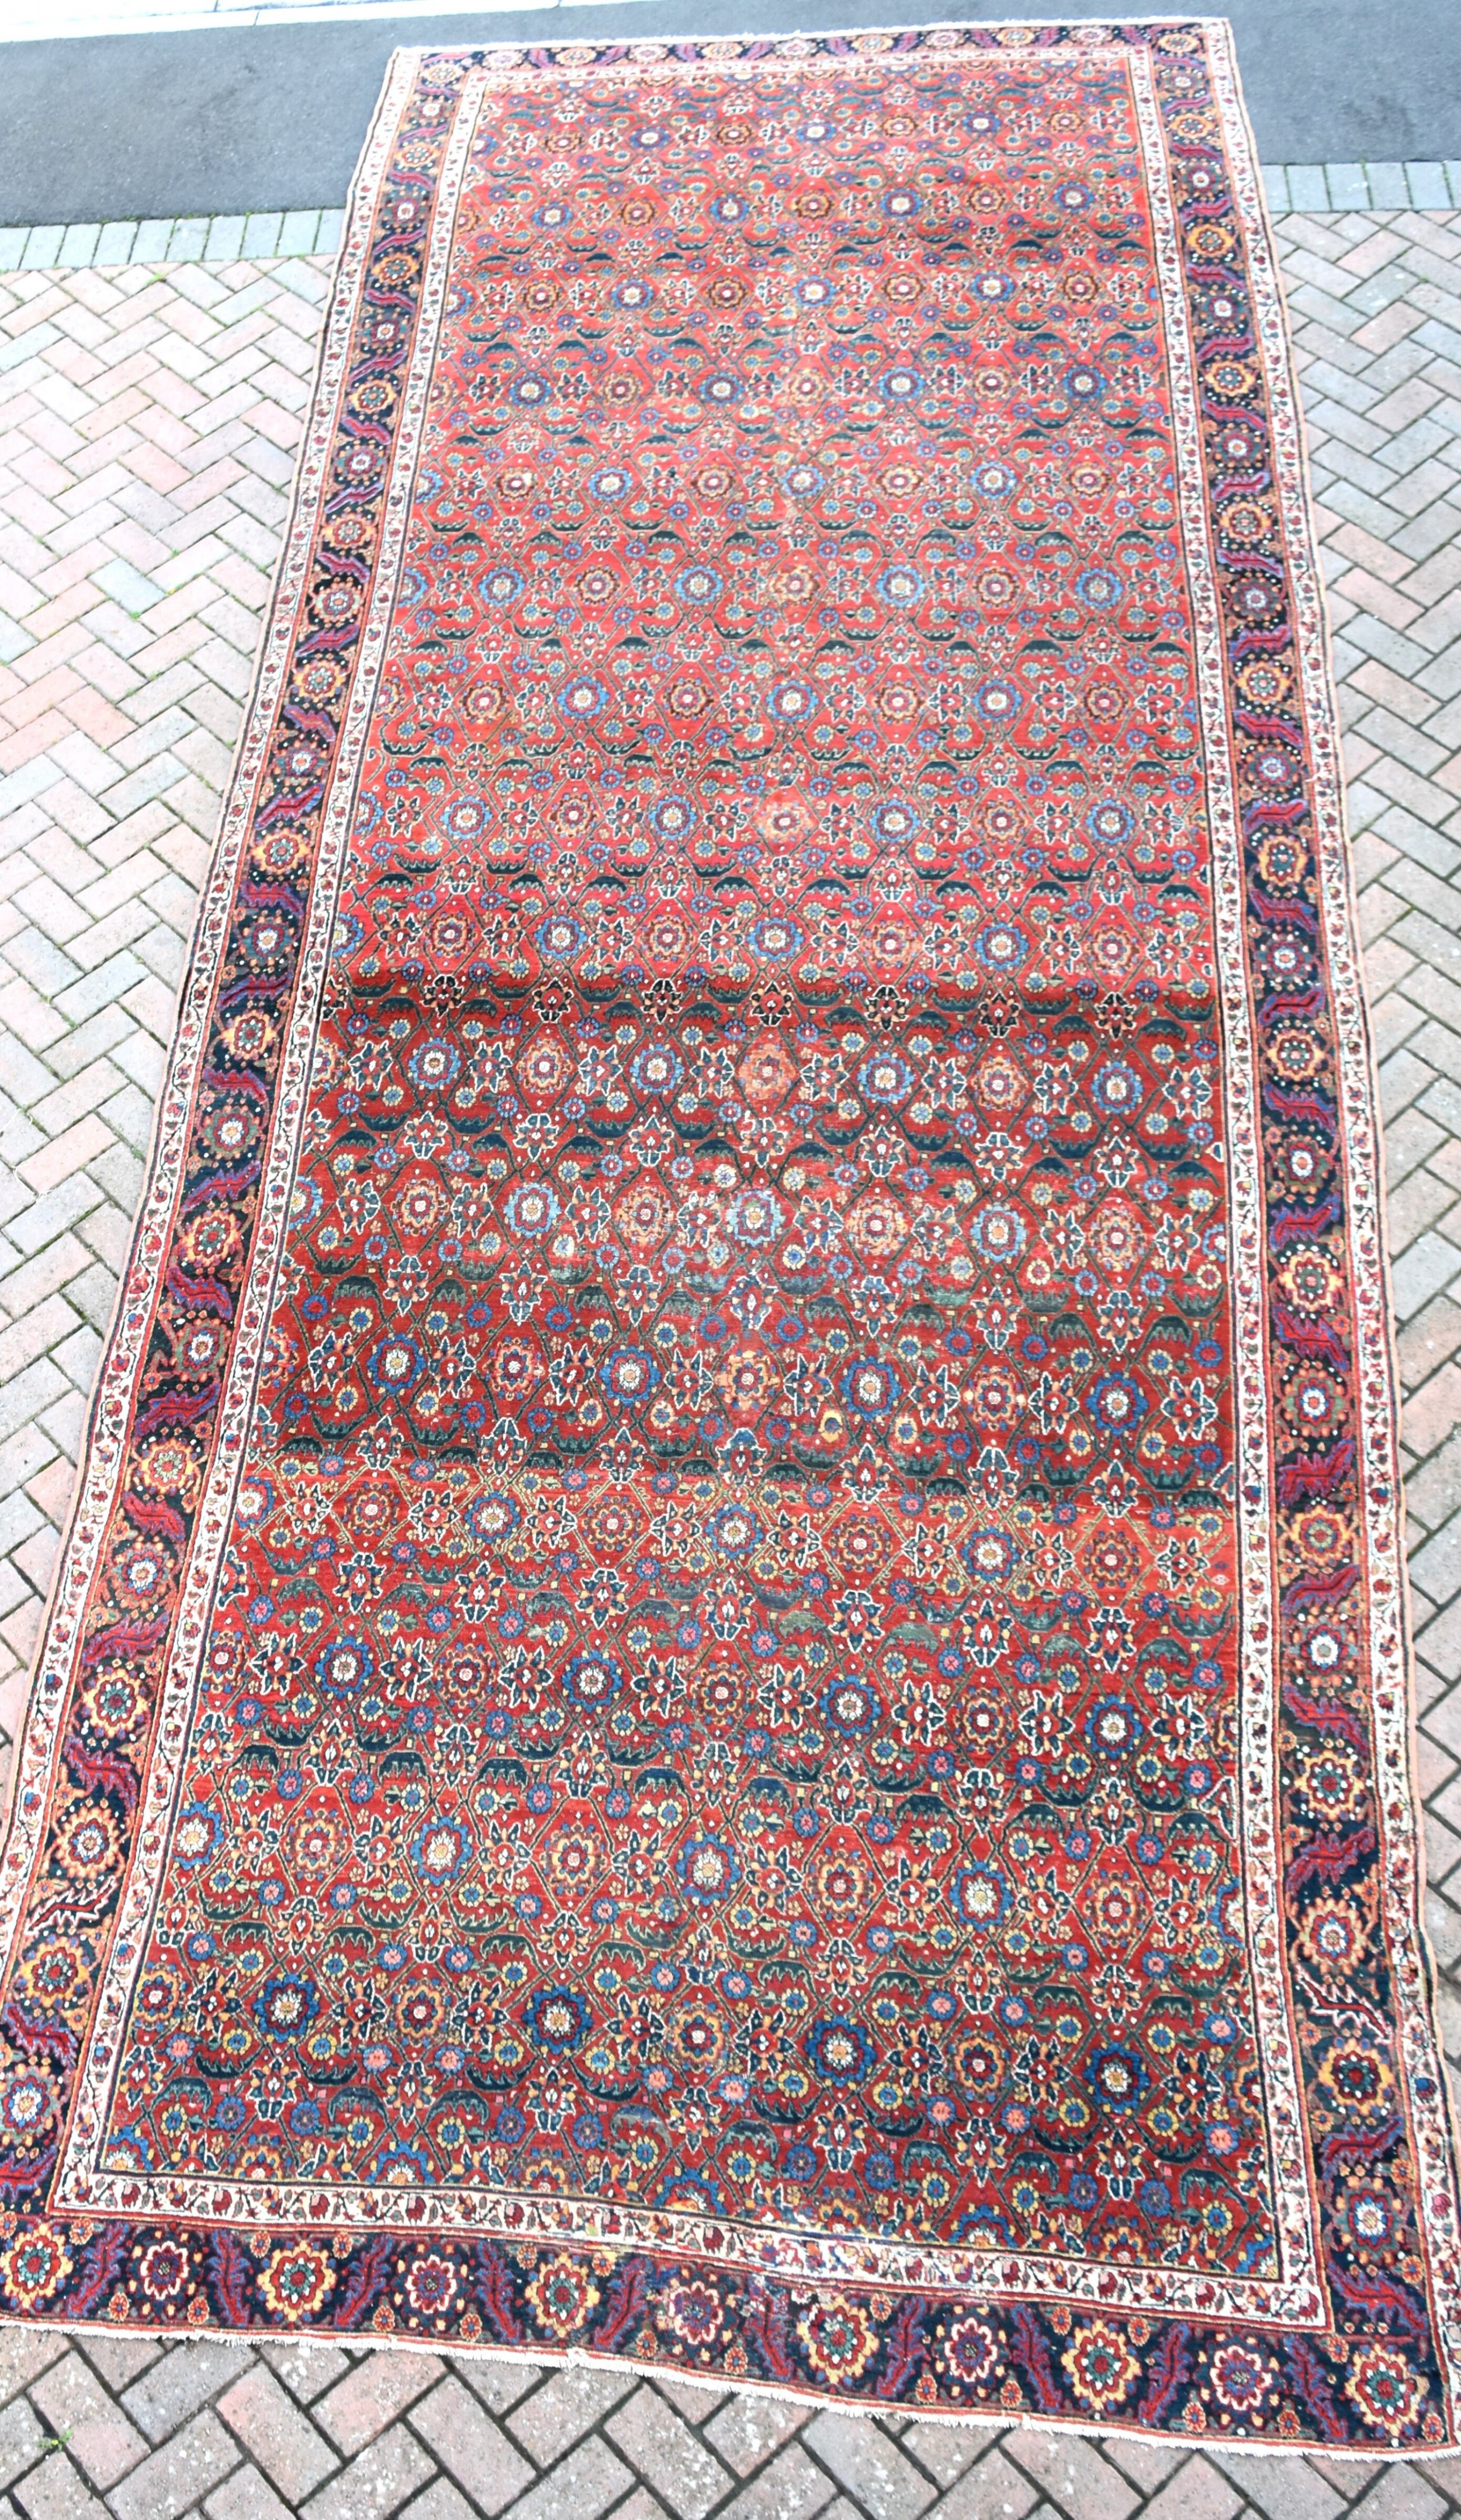 early north west persian kelleh carpet 613x214cm